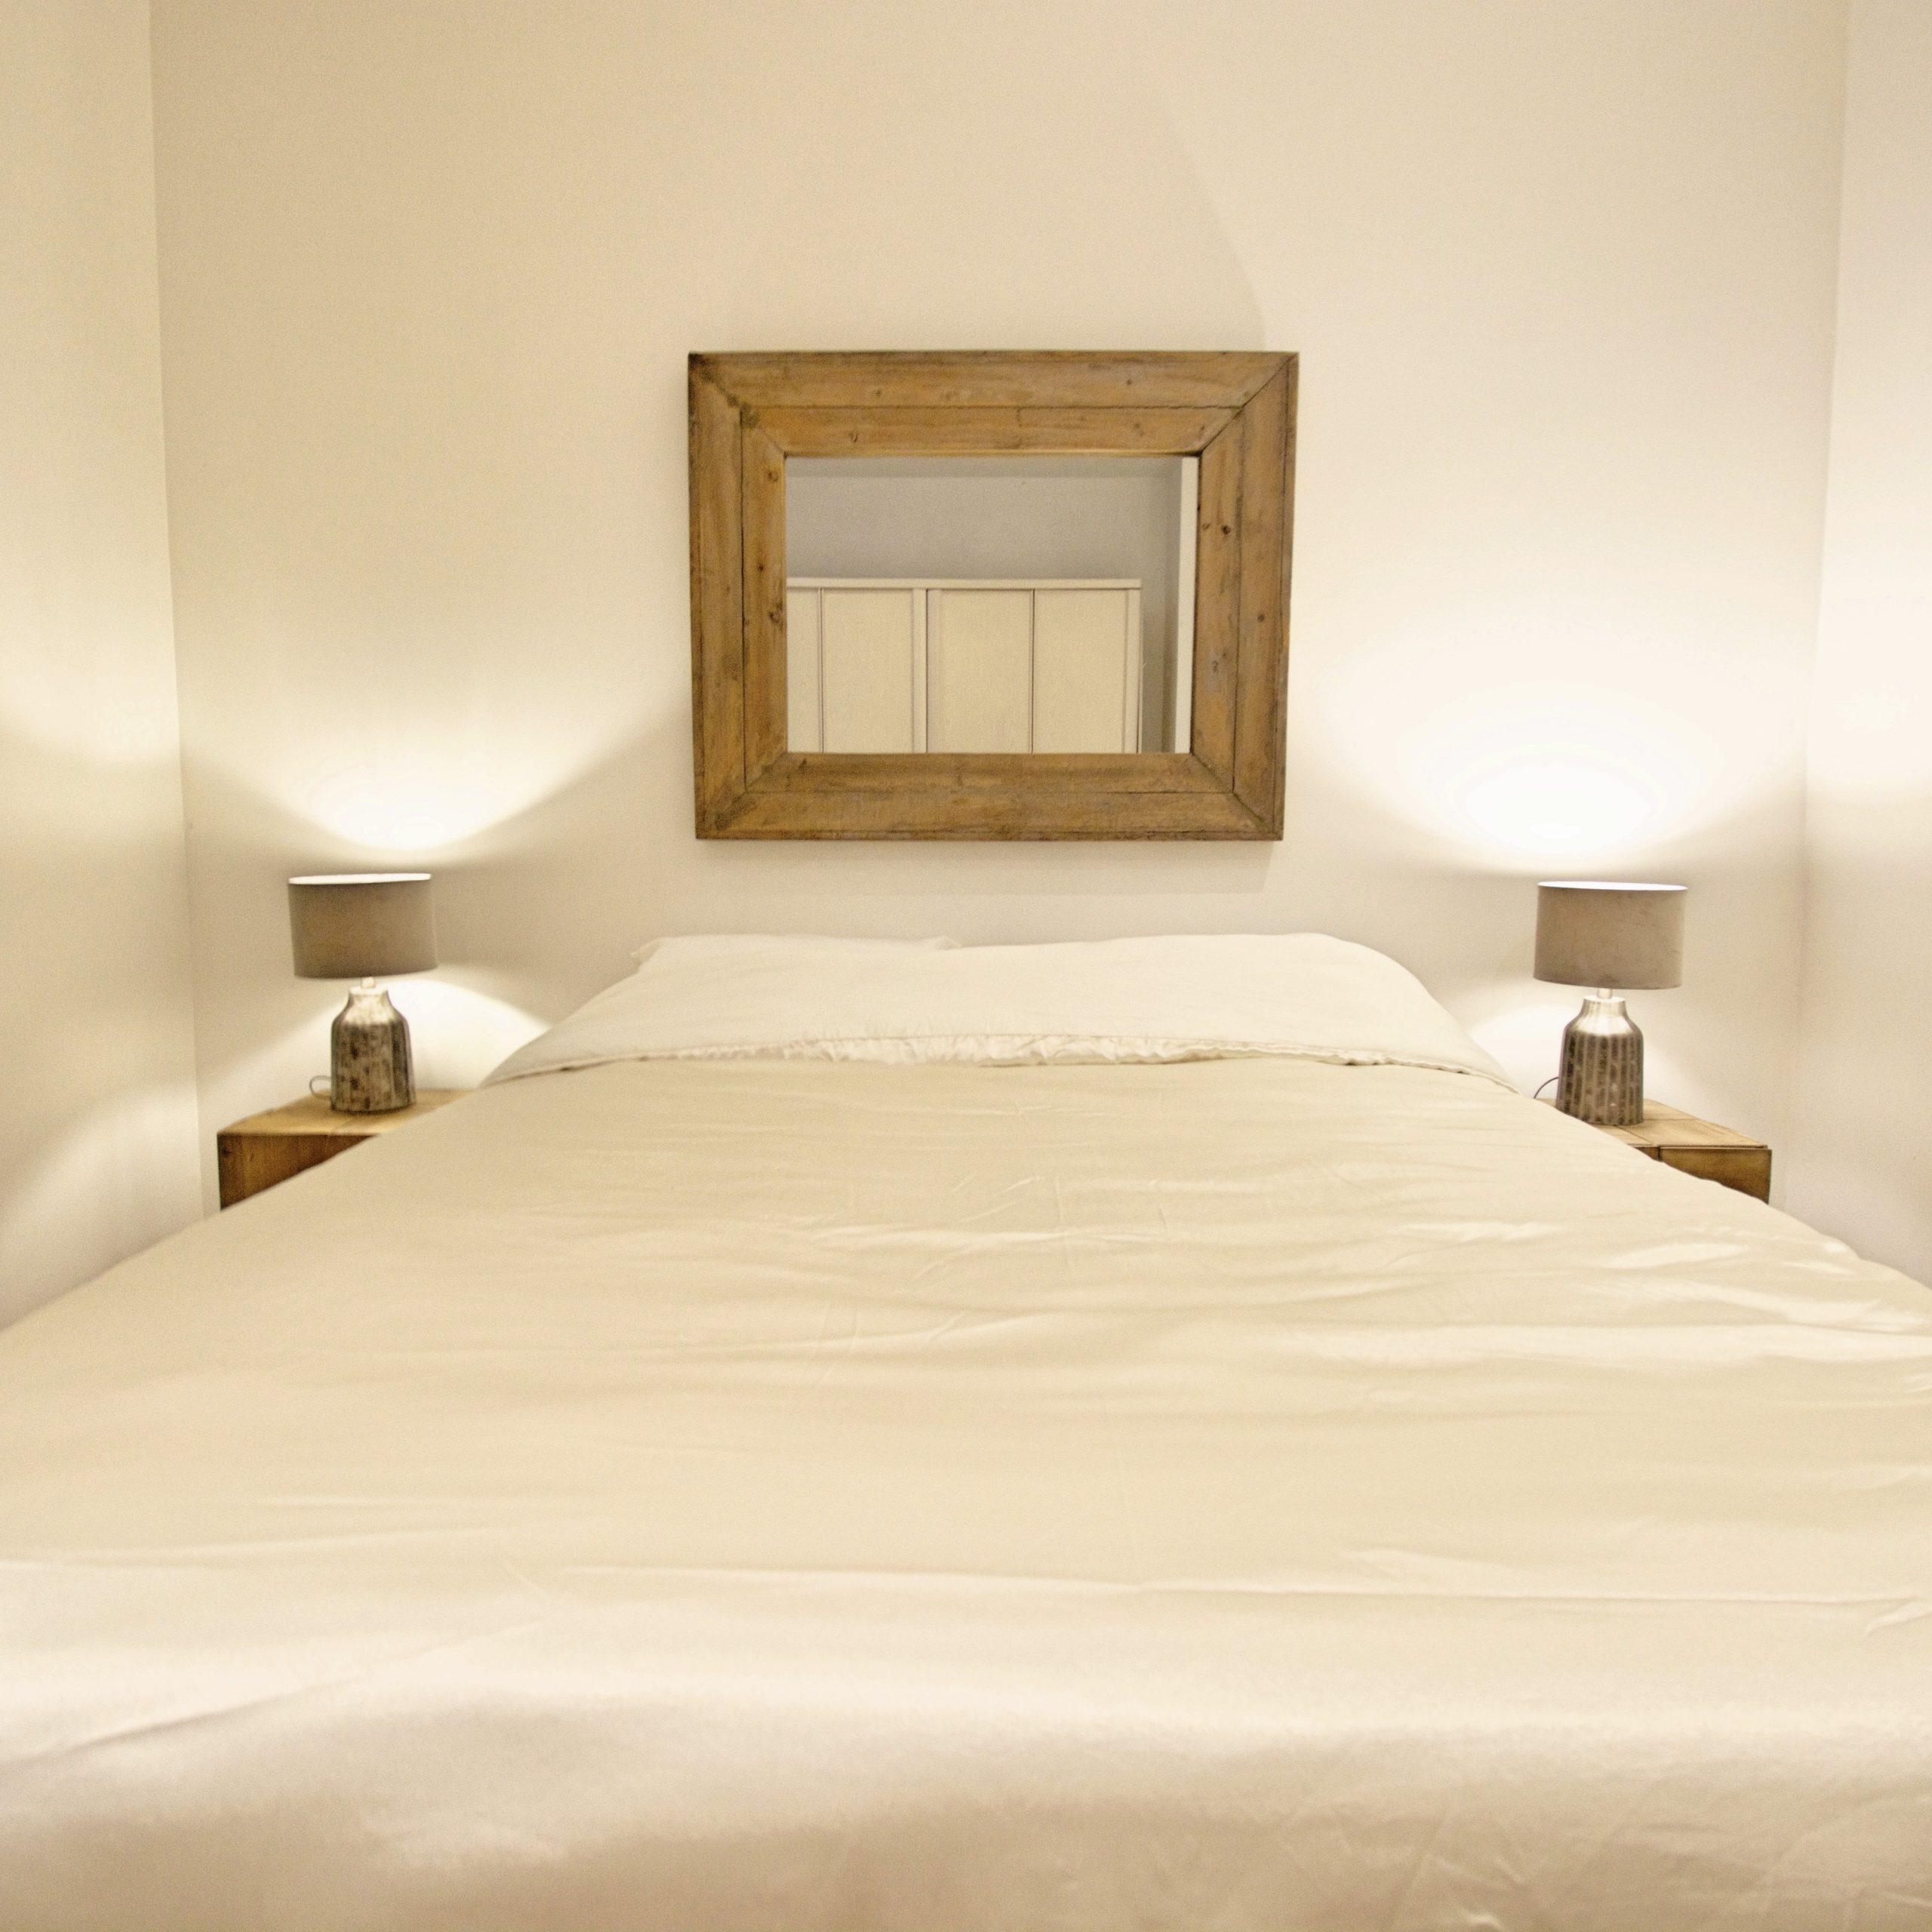 Leeuwenrui 2 - Luxury flat in Antwerp for rent